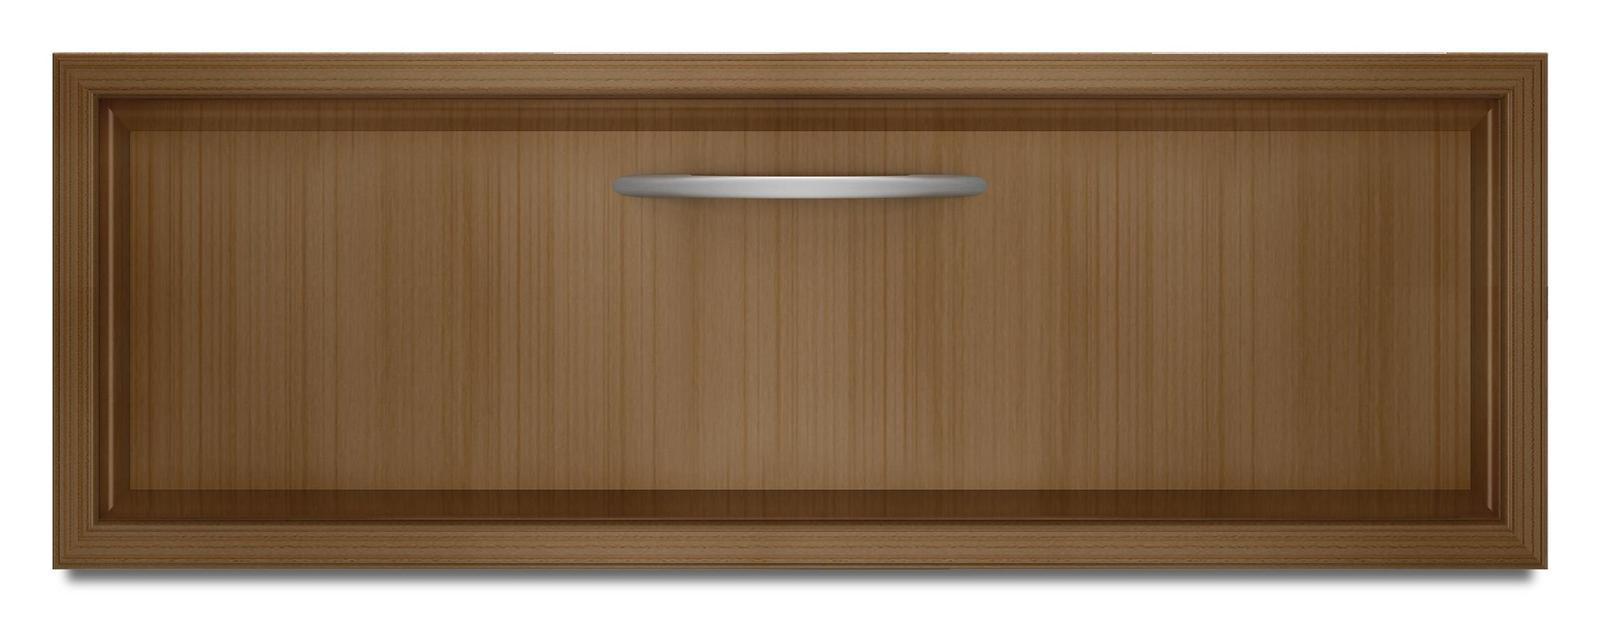 kitchenaid oven temperature sensor location kitchenaid